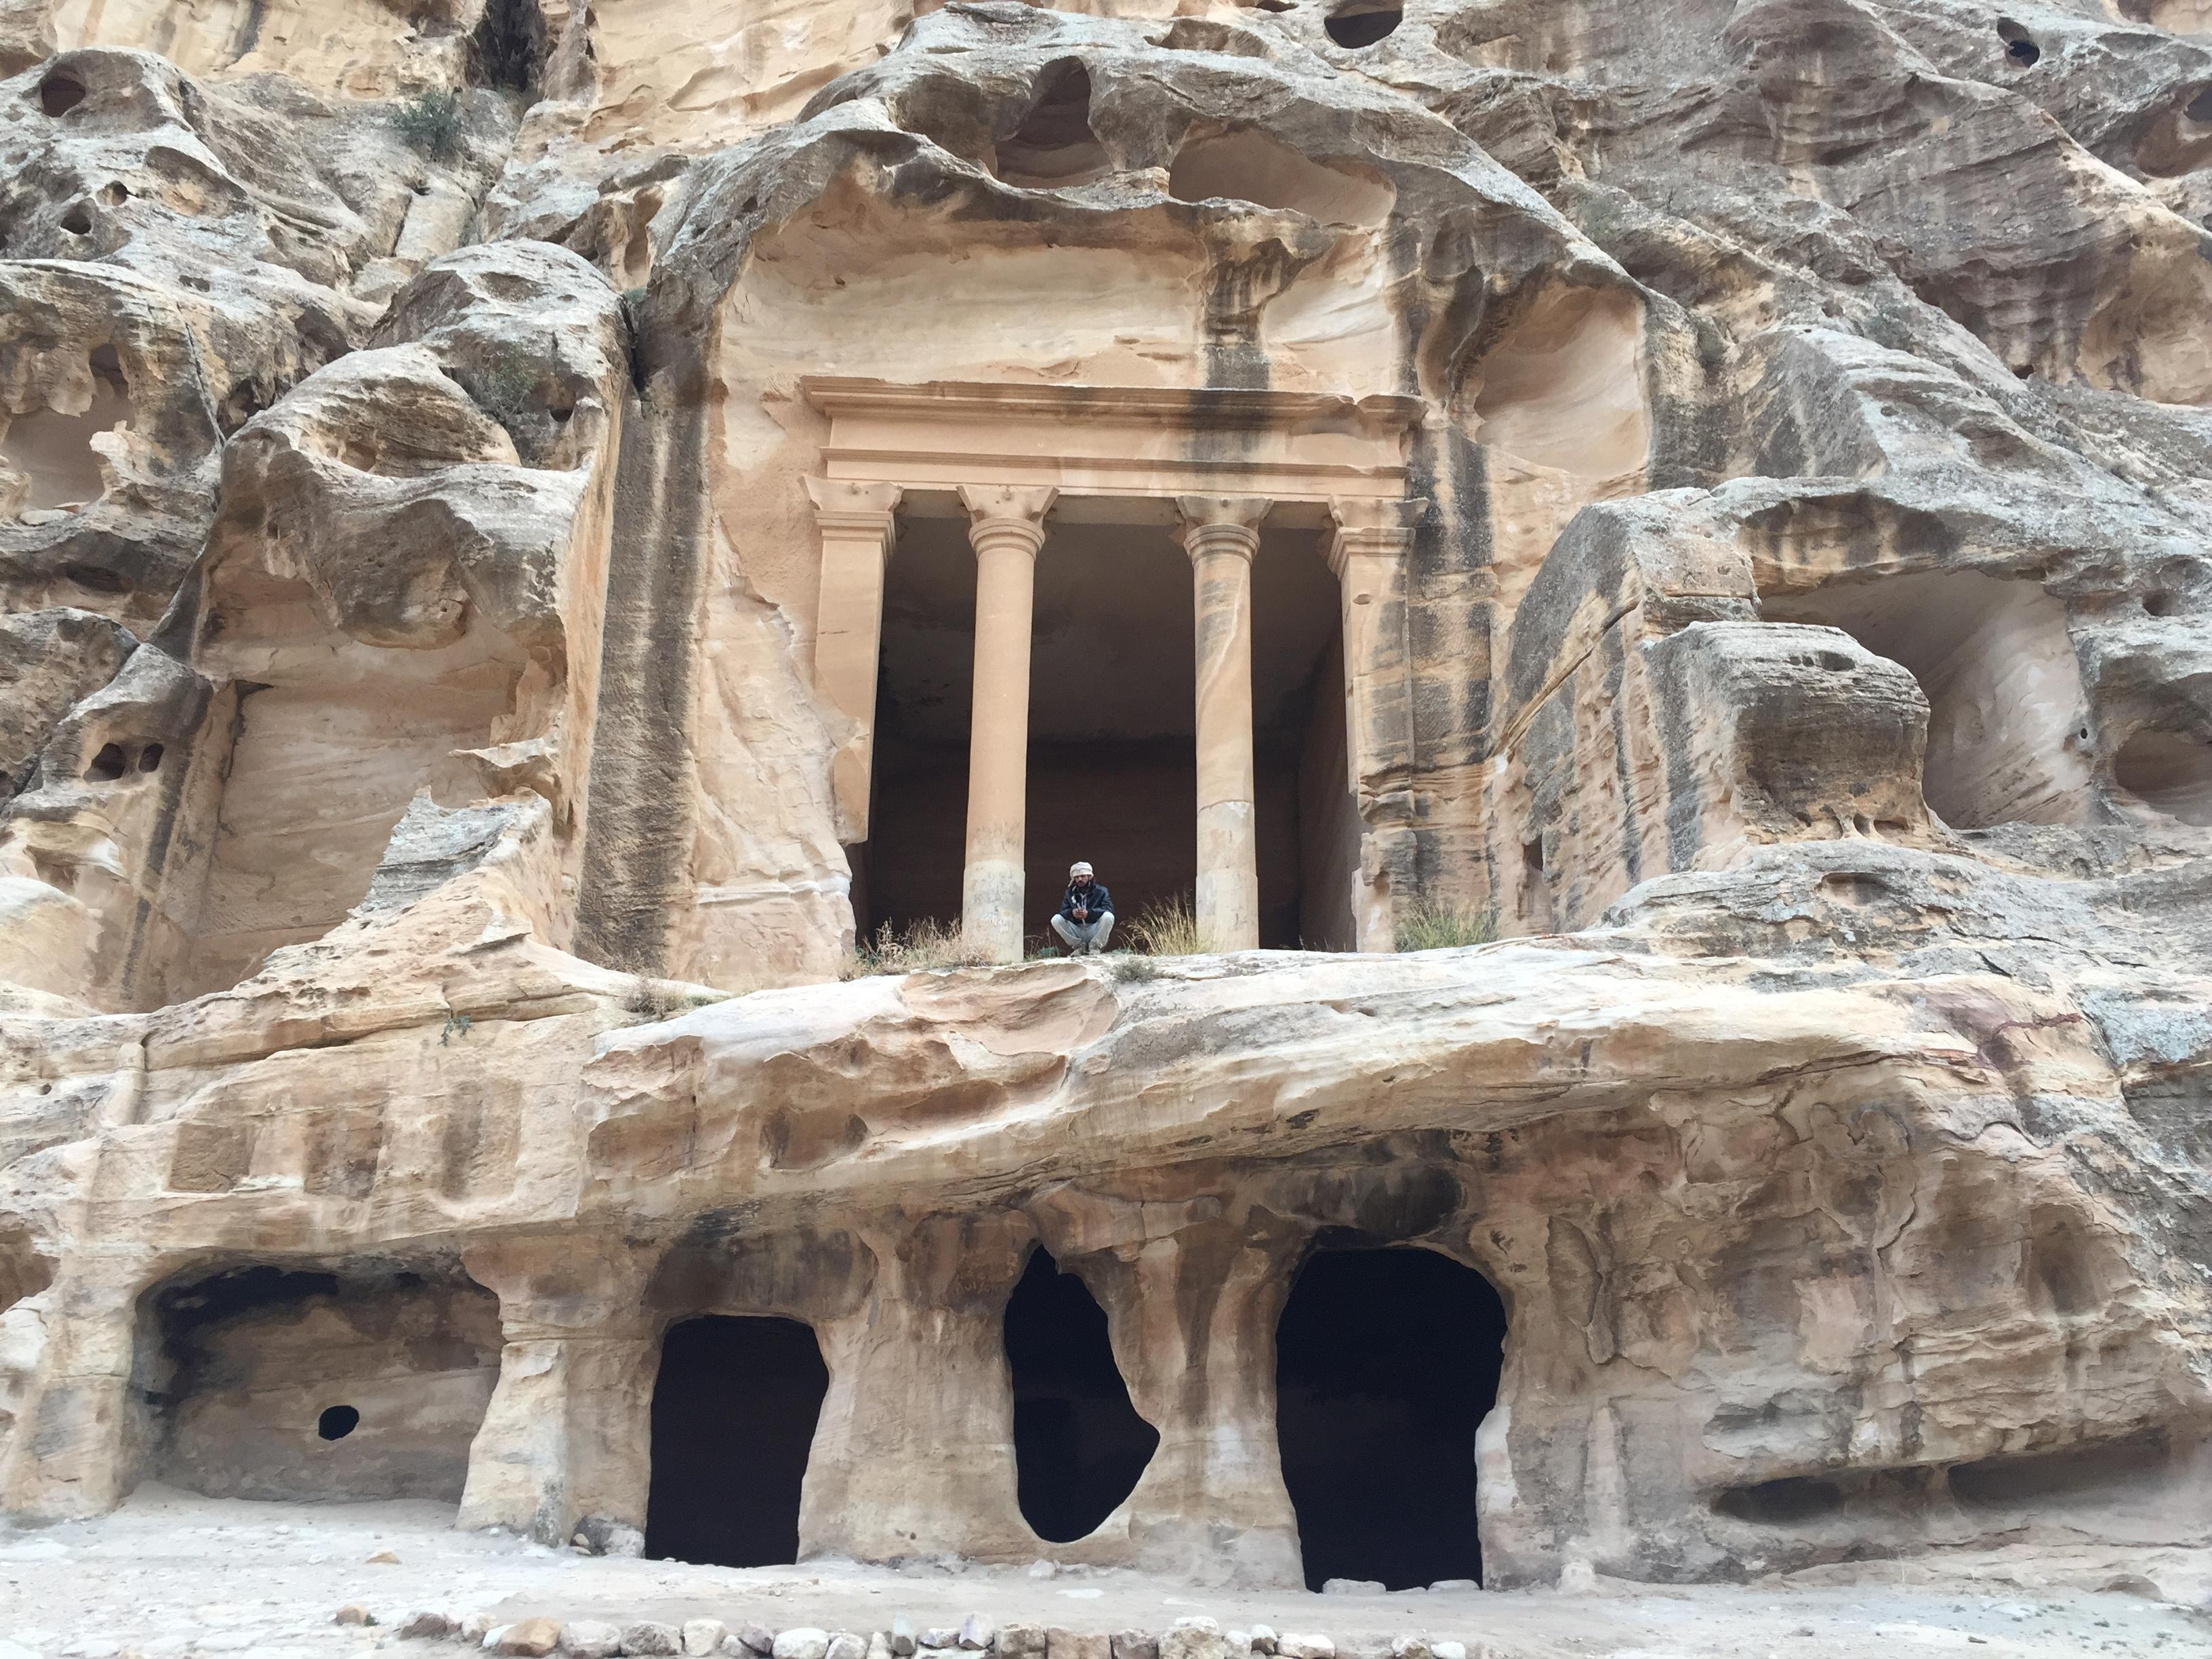 Una persona de etnia gitana tocando la flauta en Little Petra.